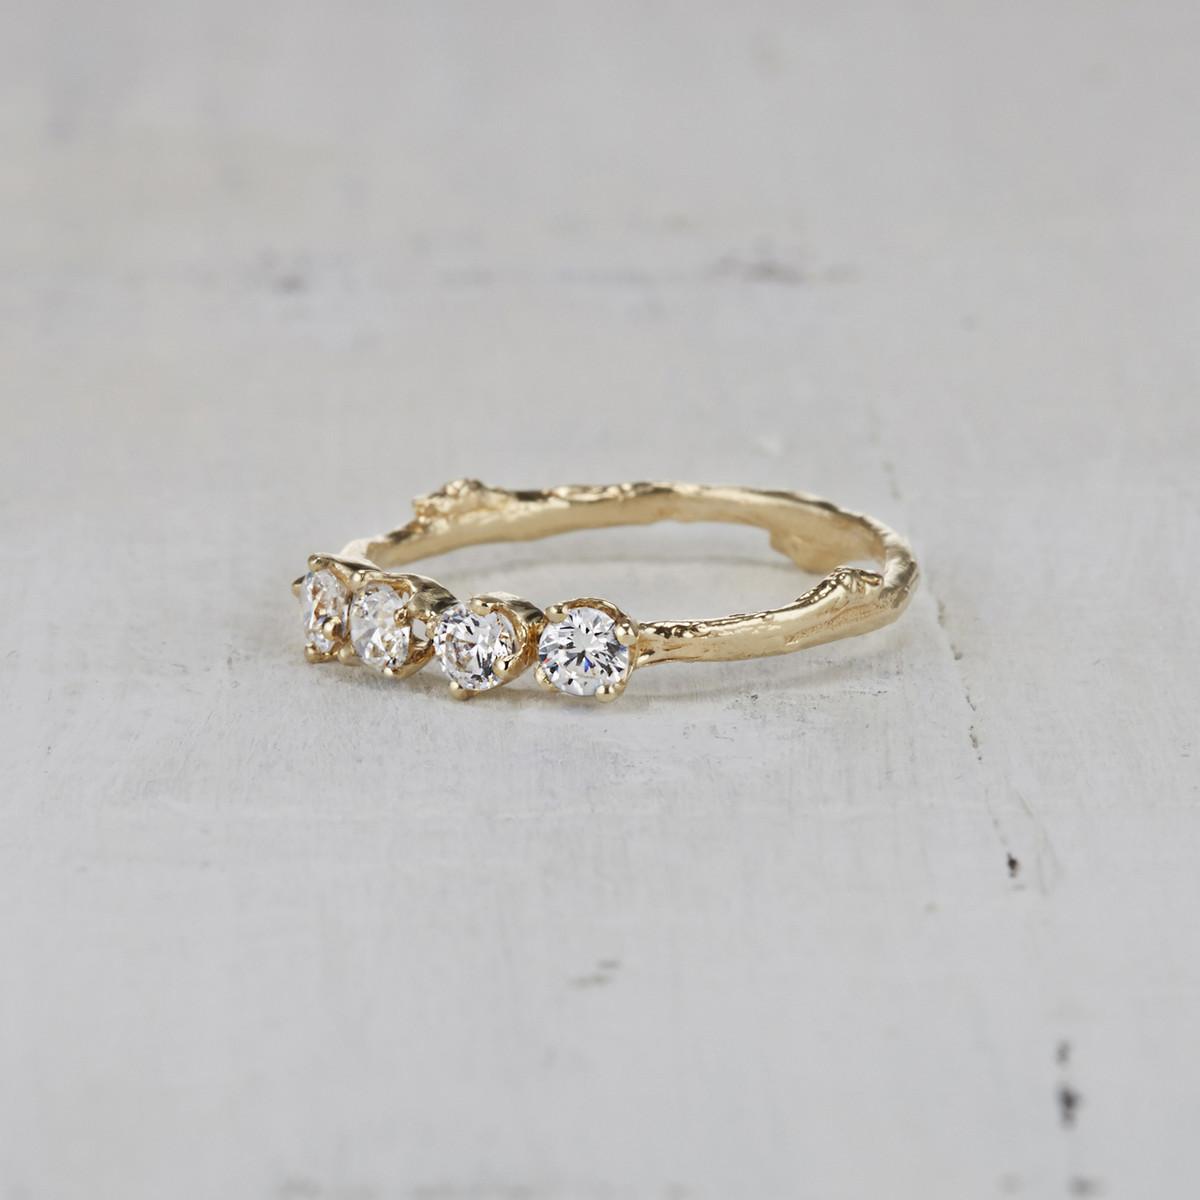 Four Stone Garland Ring - Diamond